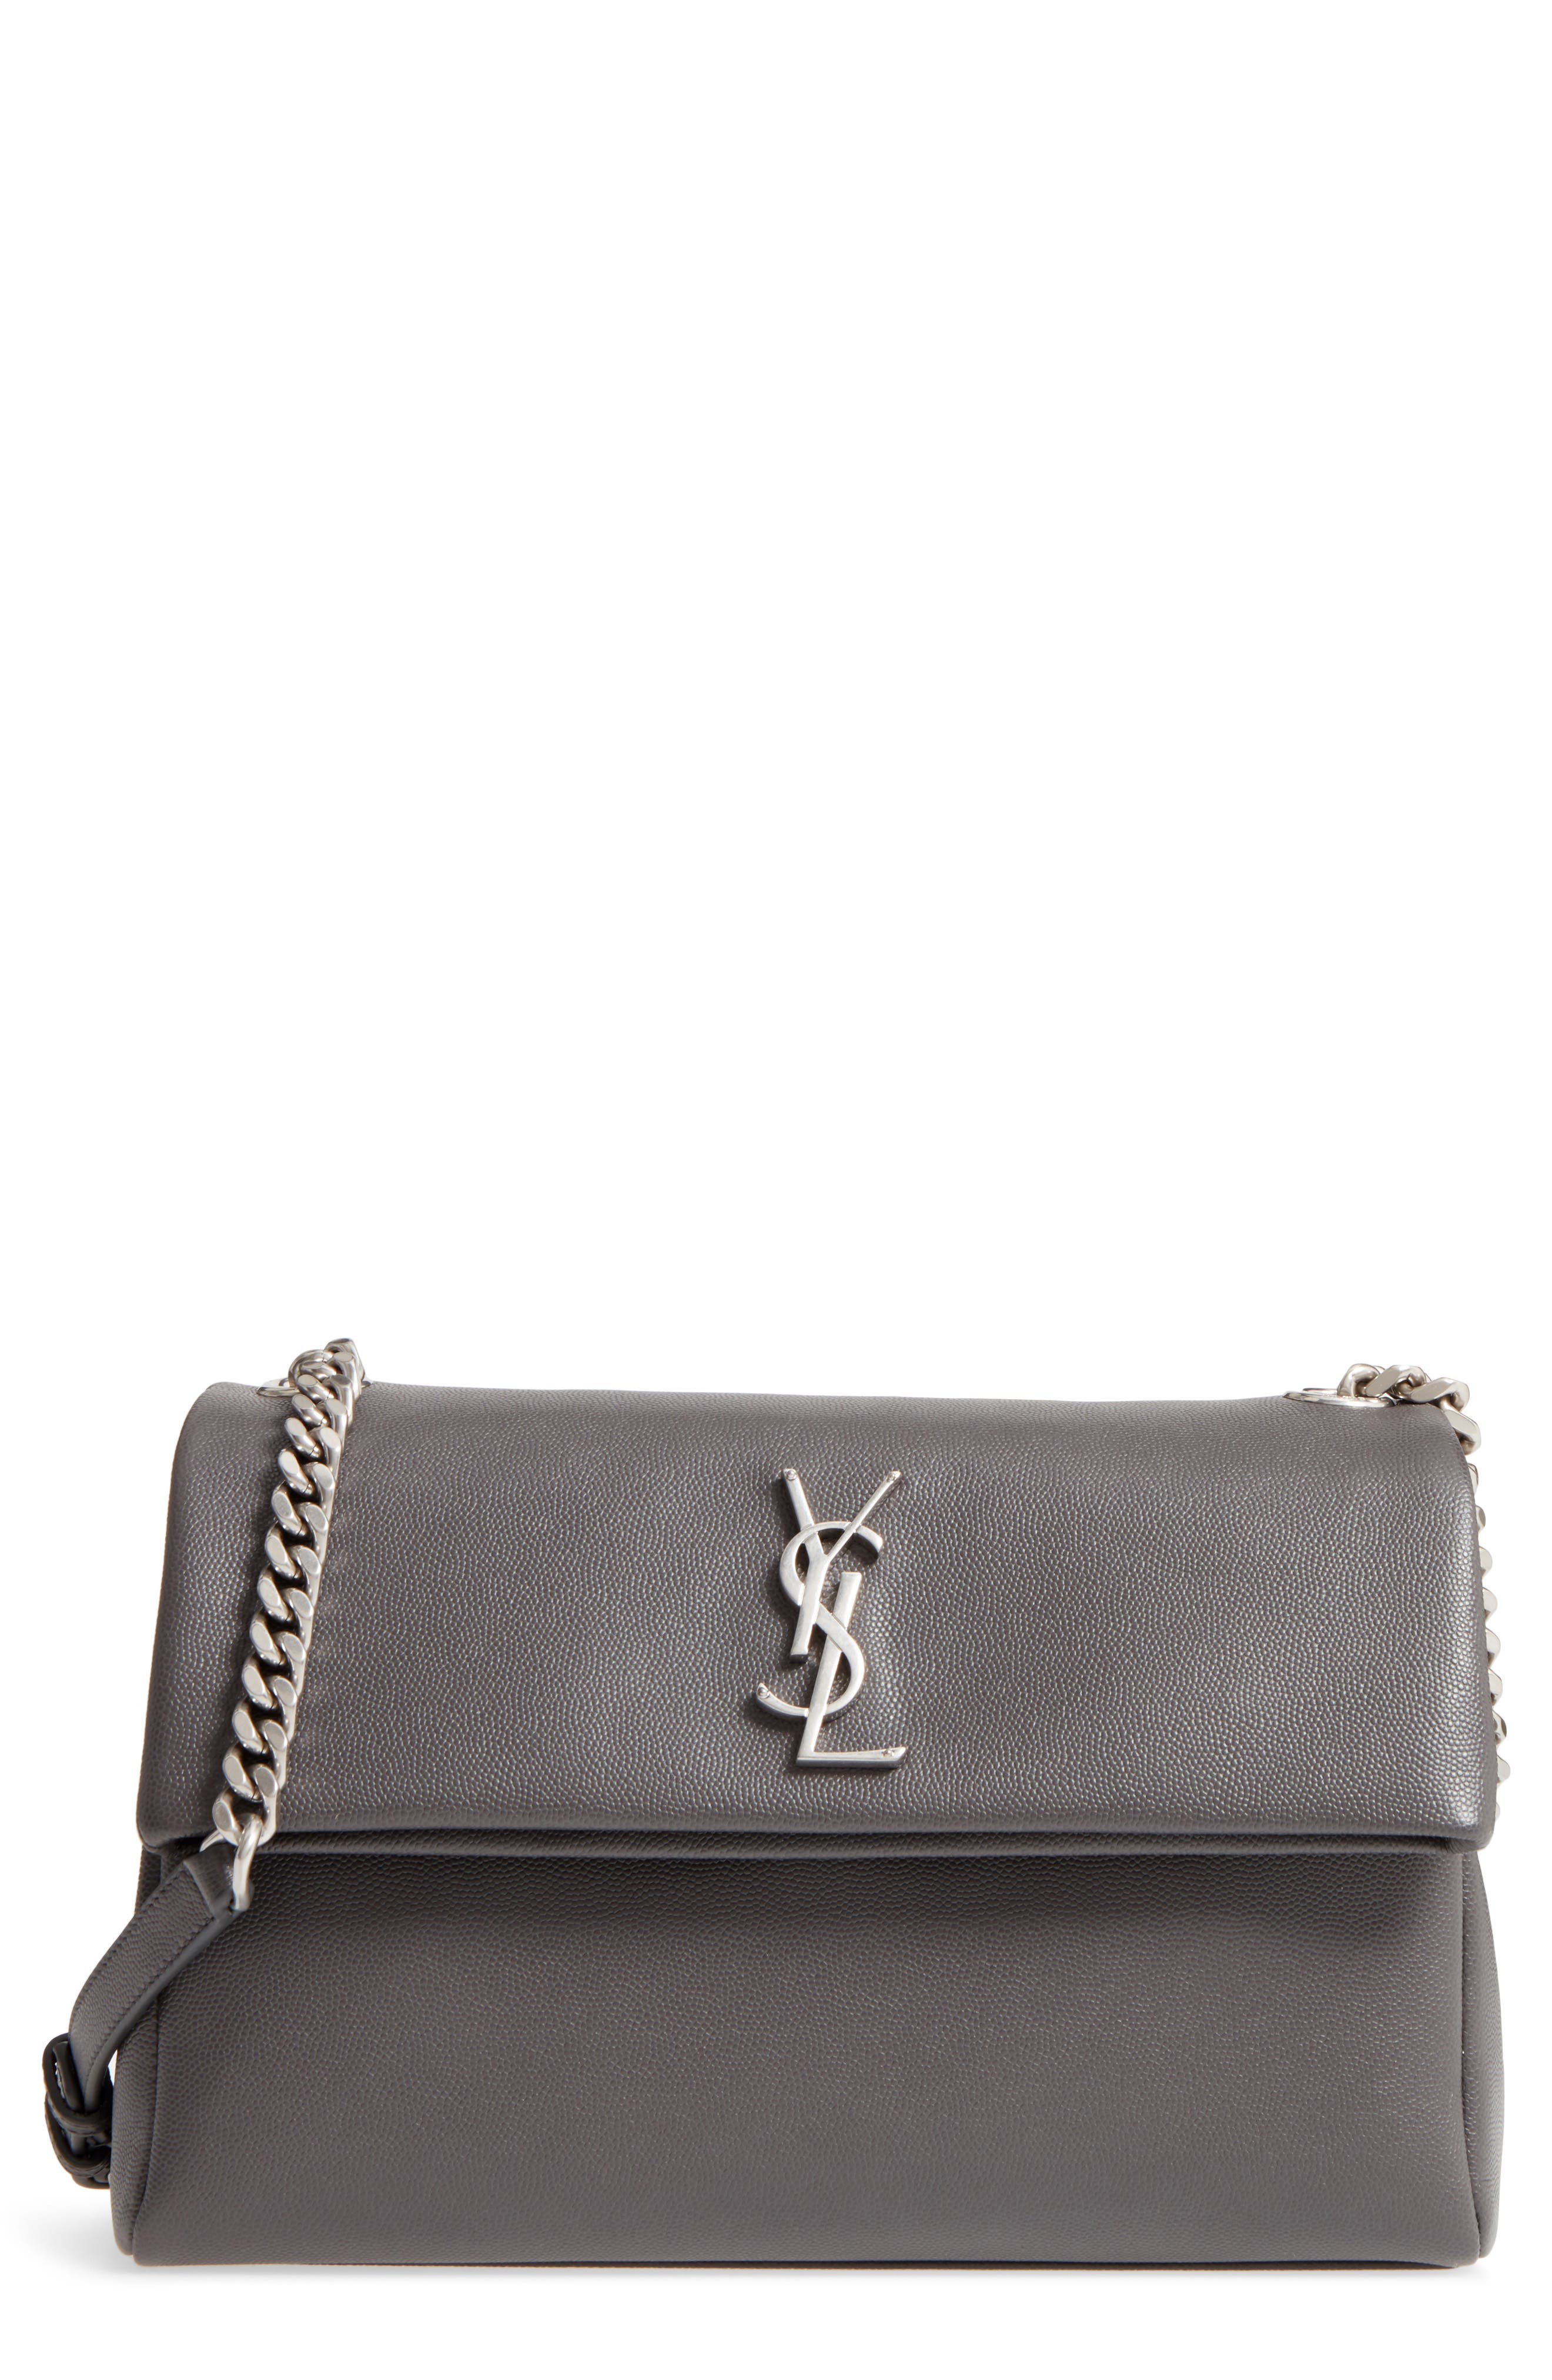 Medium West Hollywood Leather Shoulder Bag,                             Main thumbnail 1, color,